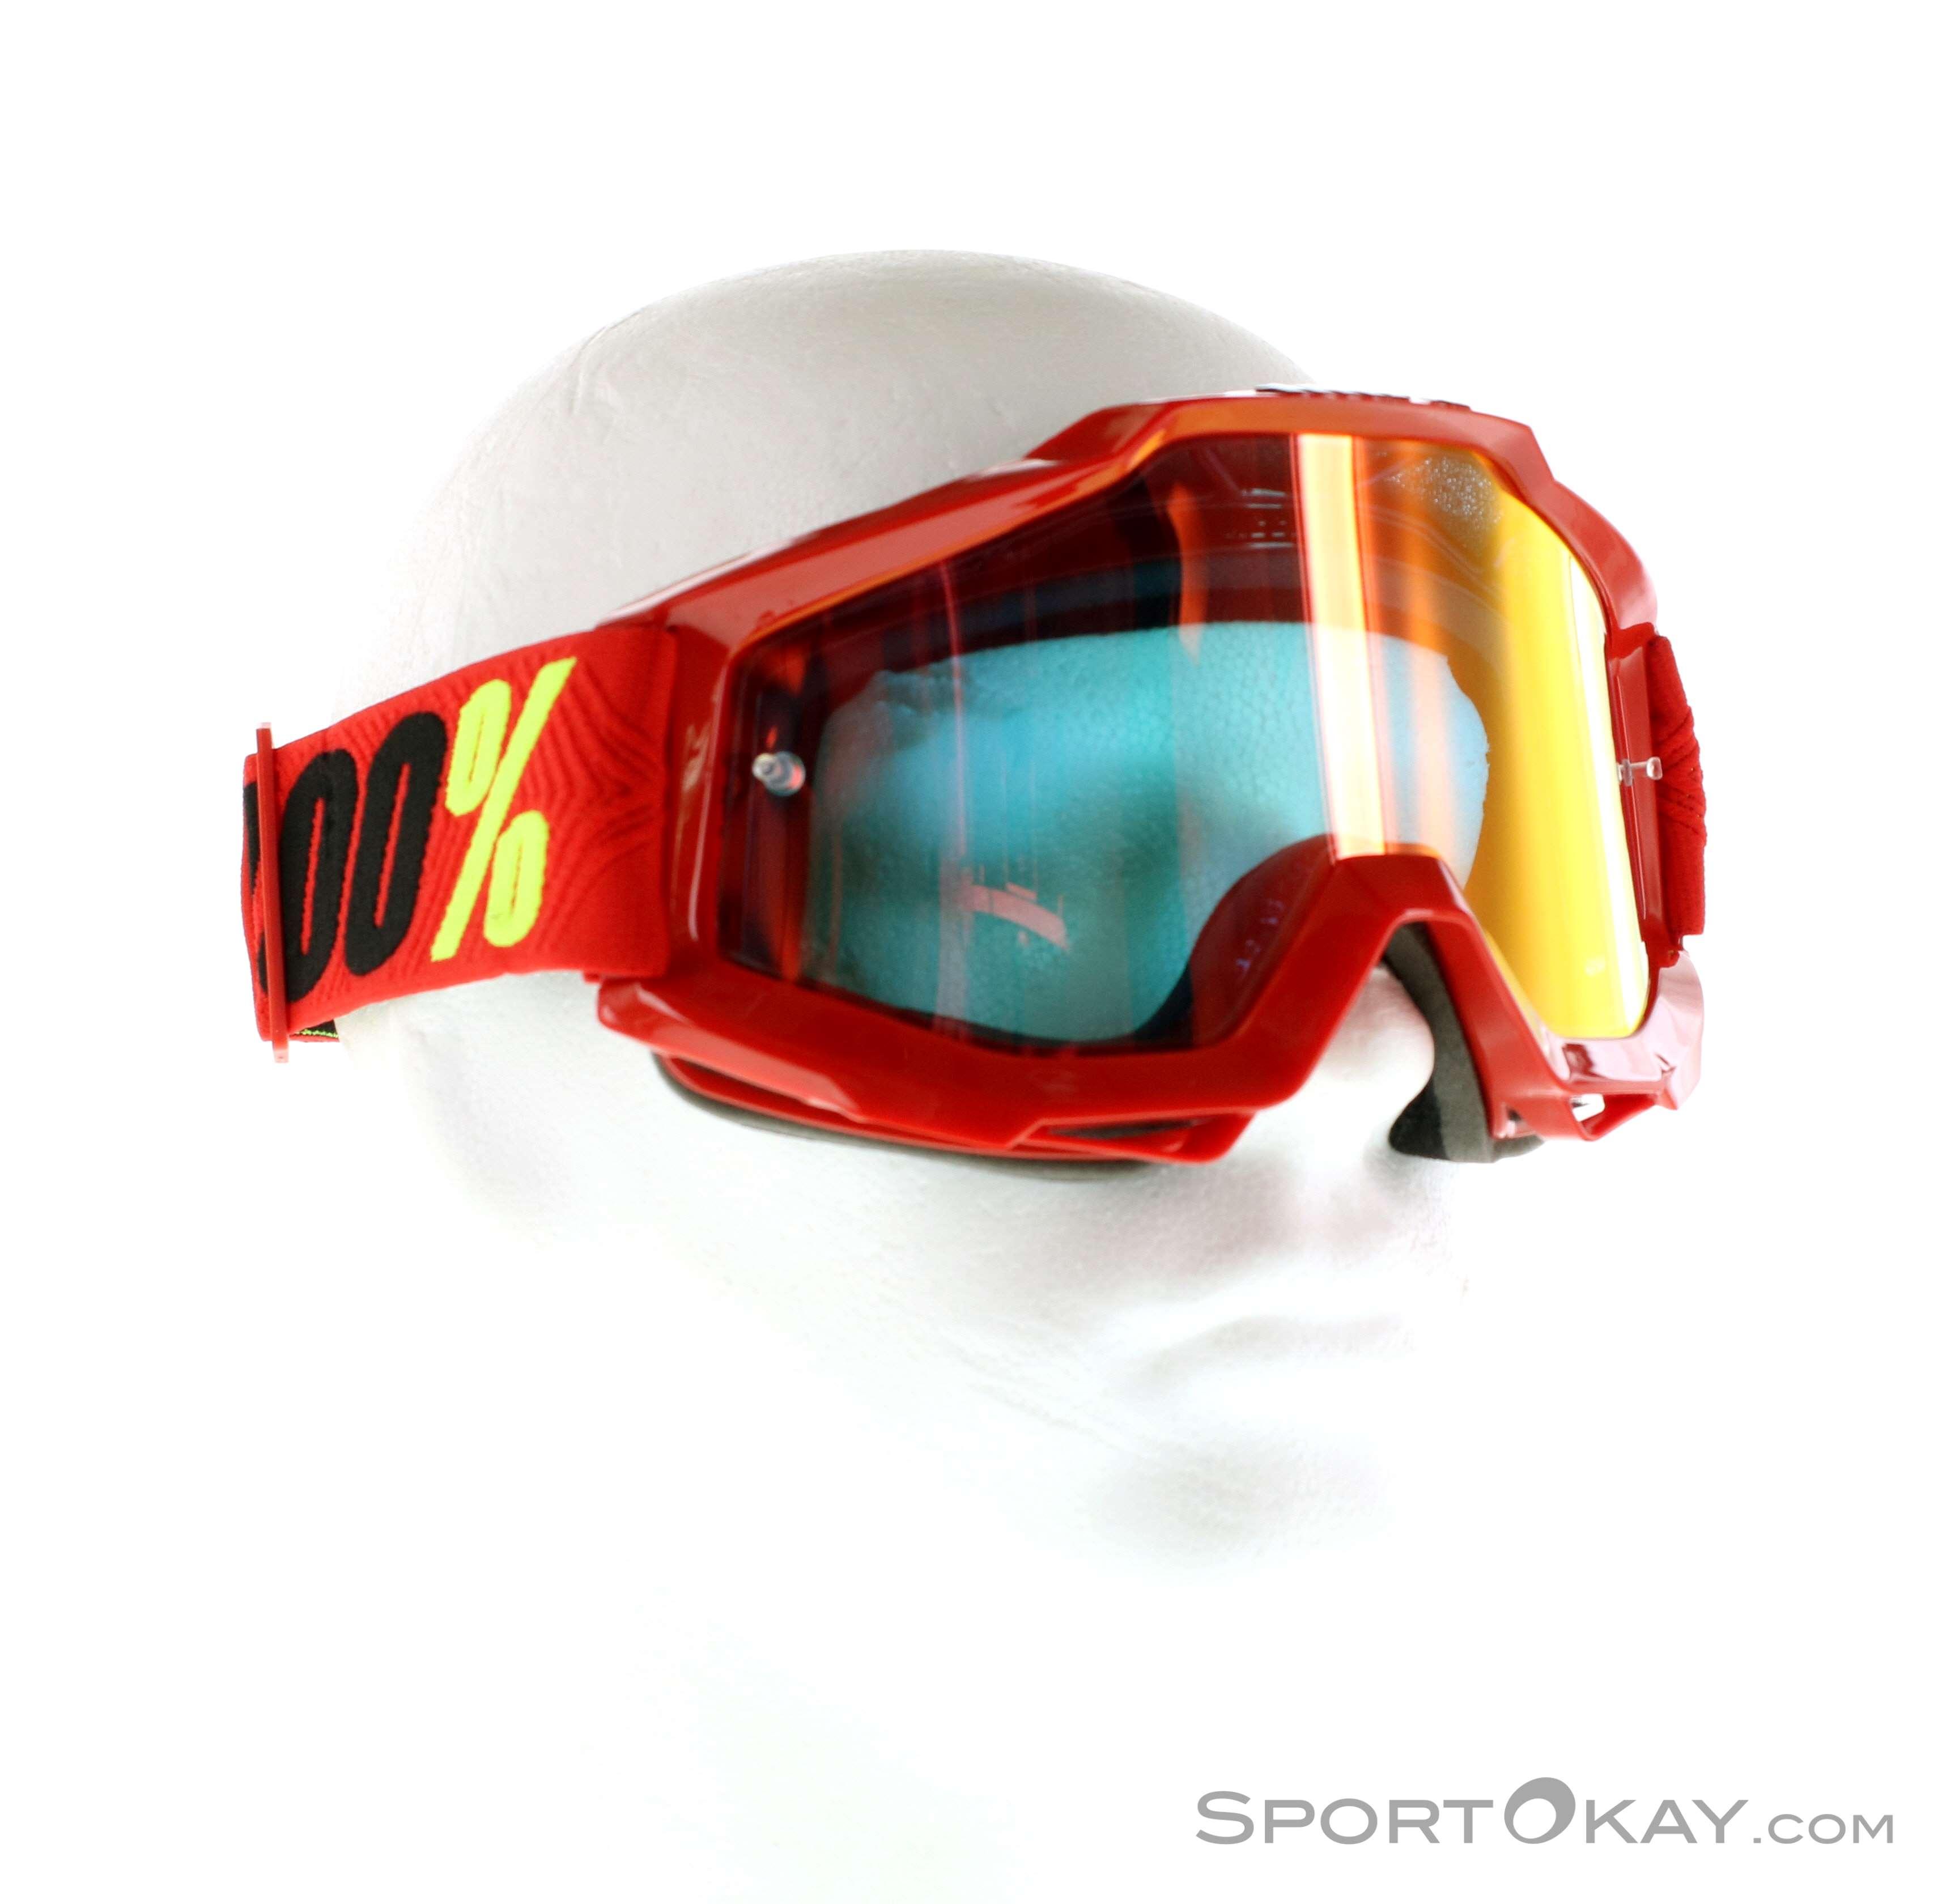 100% Accuri Anti Fog Goggle Mirror Lens Downhillbrille, 100%, Rot, , Herren, 0156-10039, 5637544521, 841269104197, N1-01.jpg